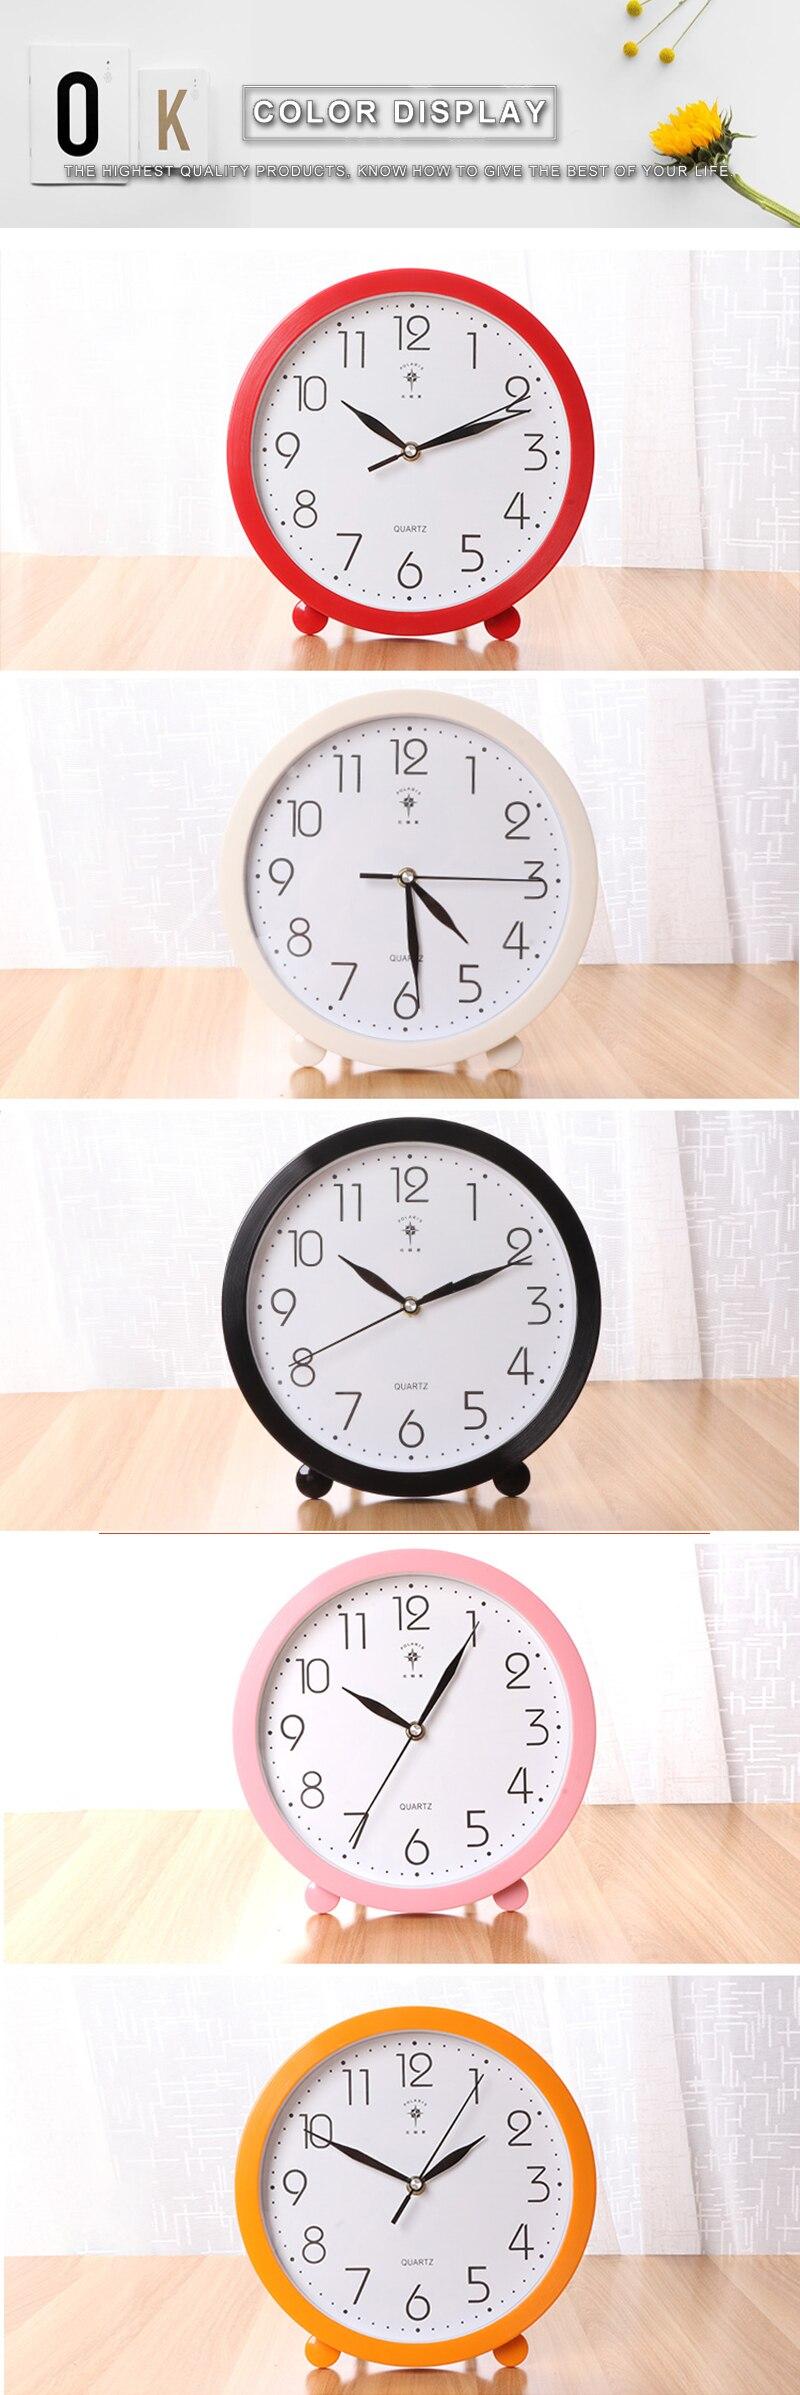 vintage islamic clock electronic wall clock muslim clock retro wave desk digital clock office watch digital clock desk large wall clock (8)